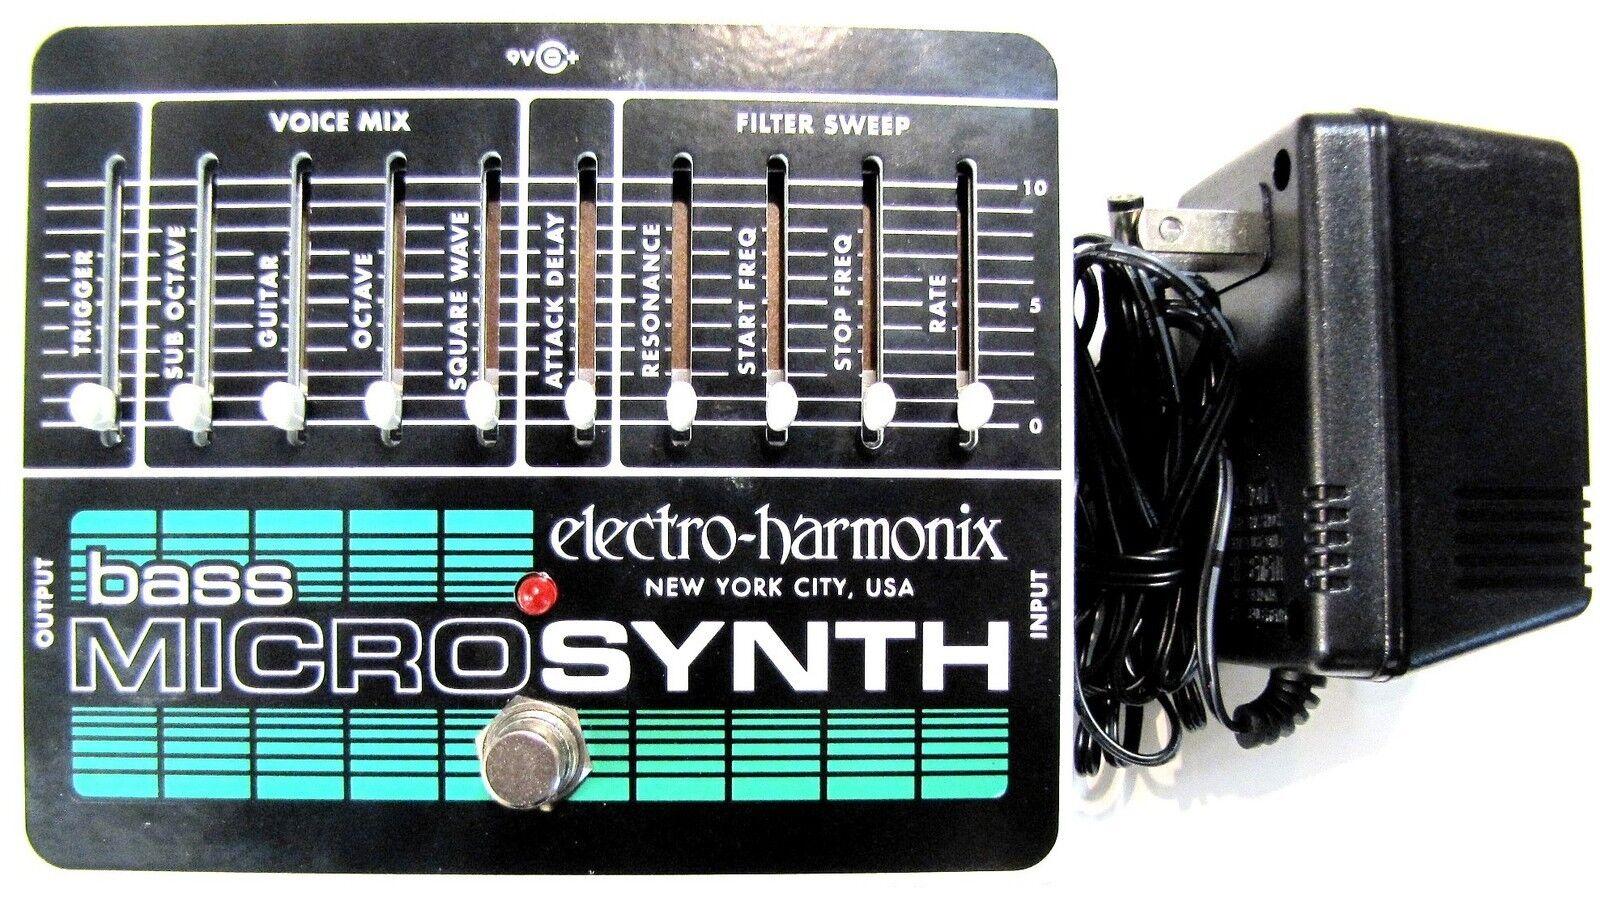 Utiliza Electro-Harmonix EHX bajo    Sintetizador Micro Microsynth Analog  mas preferencial